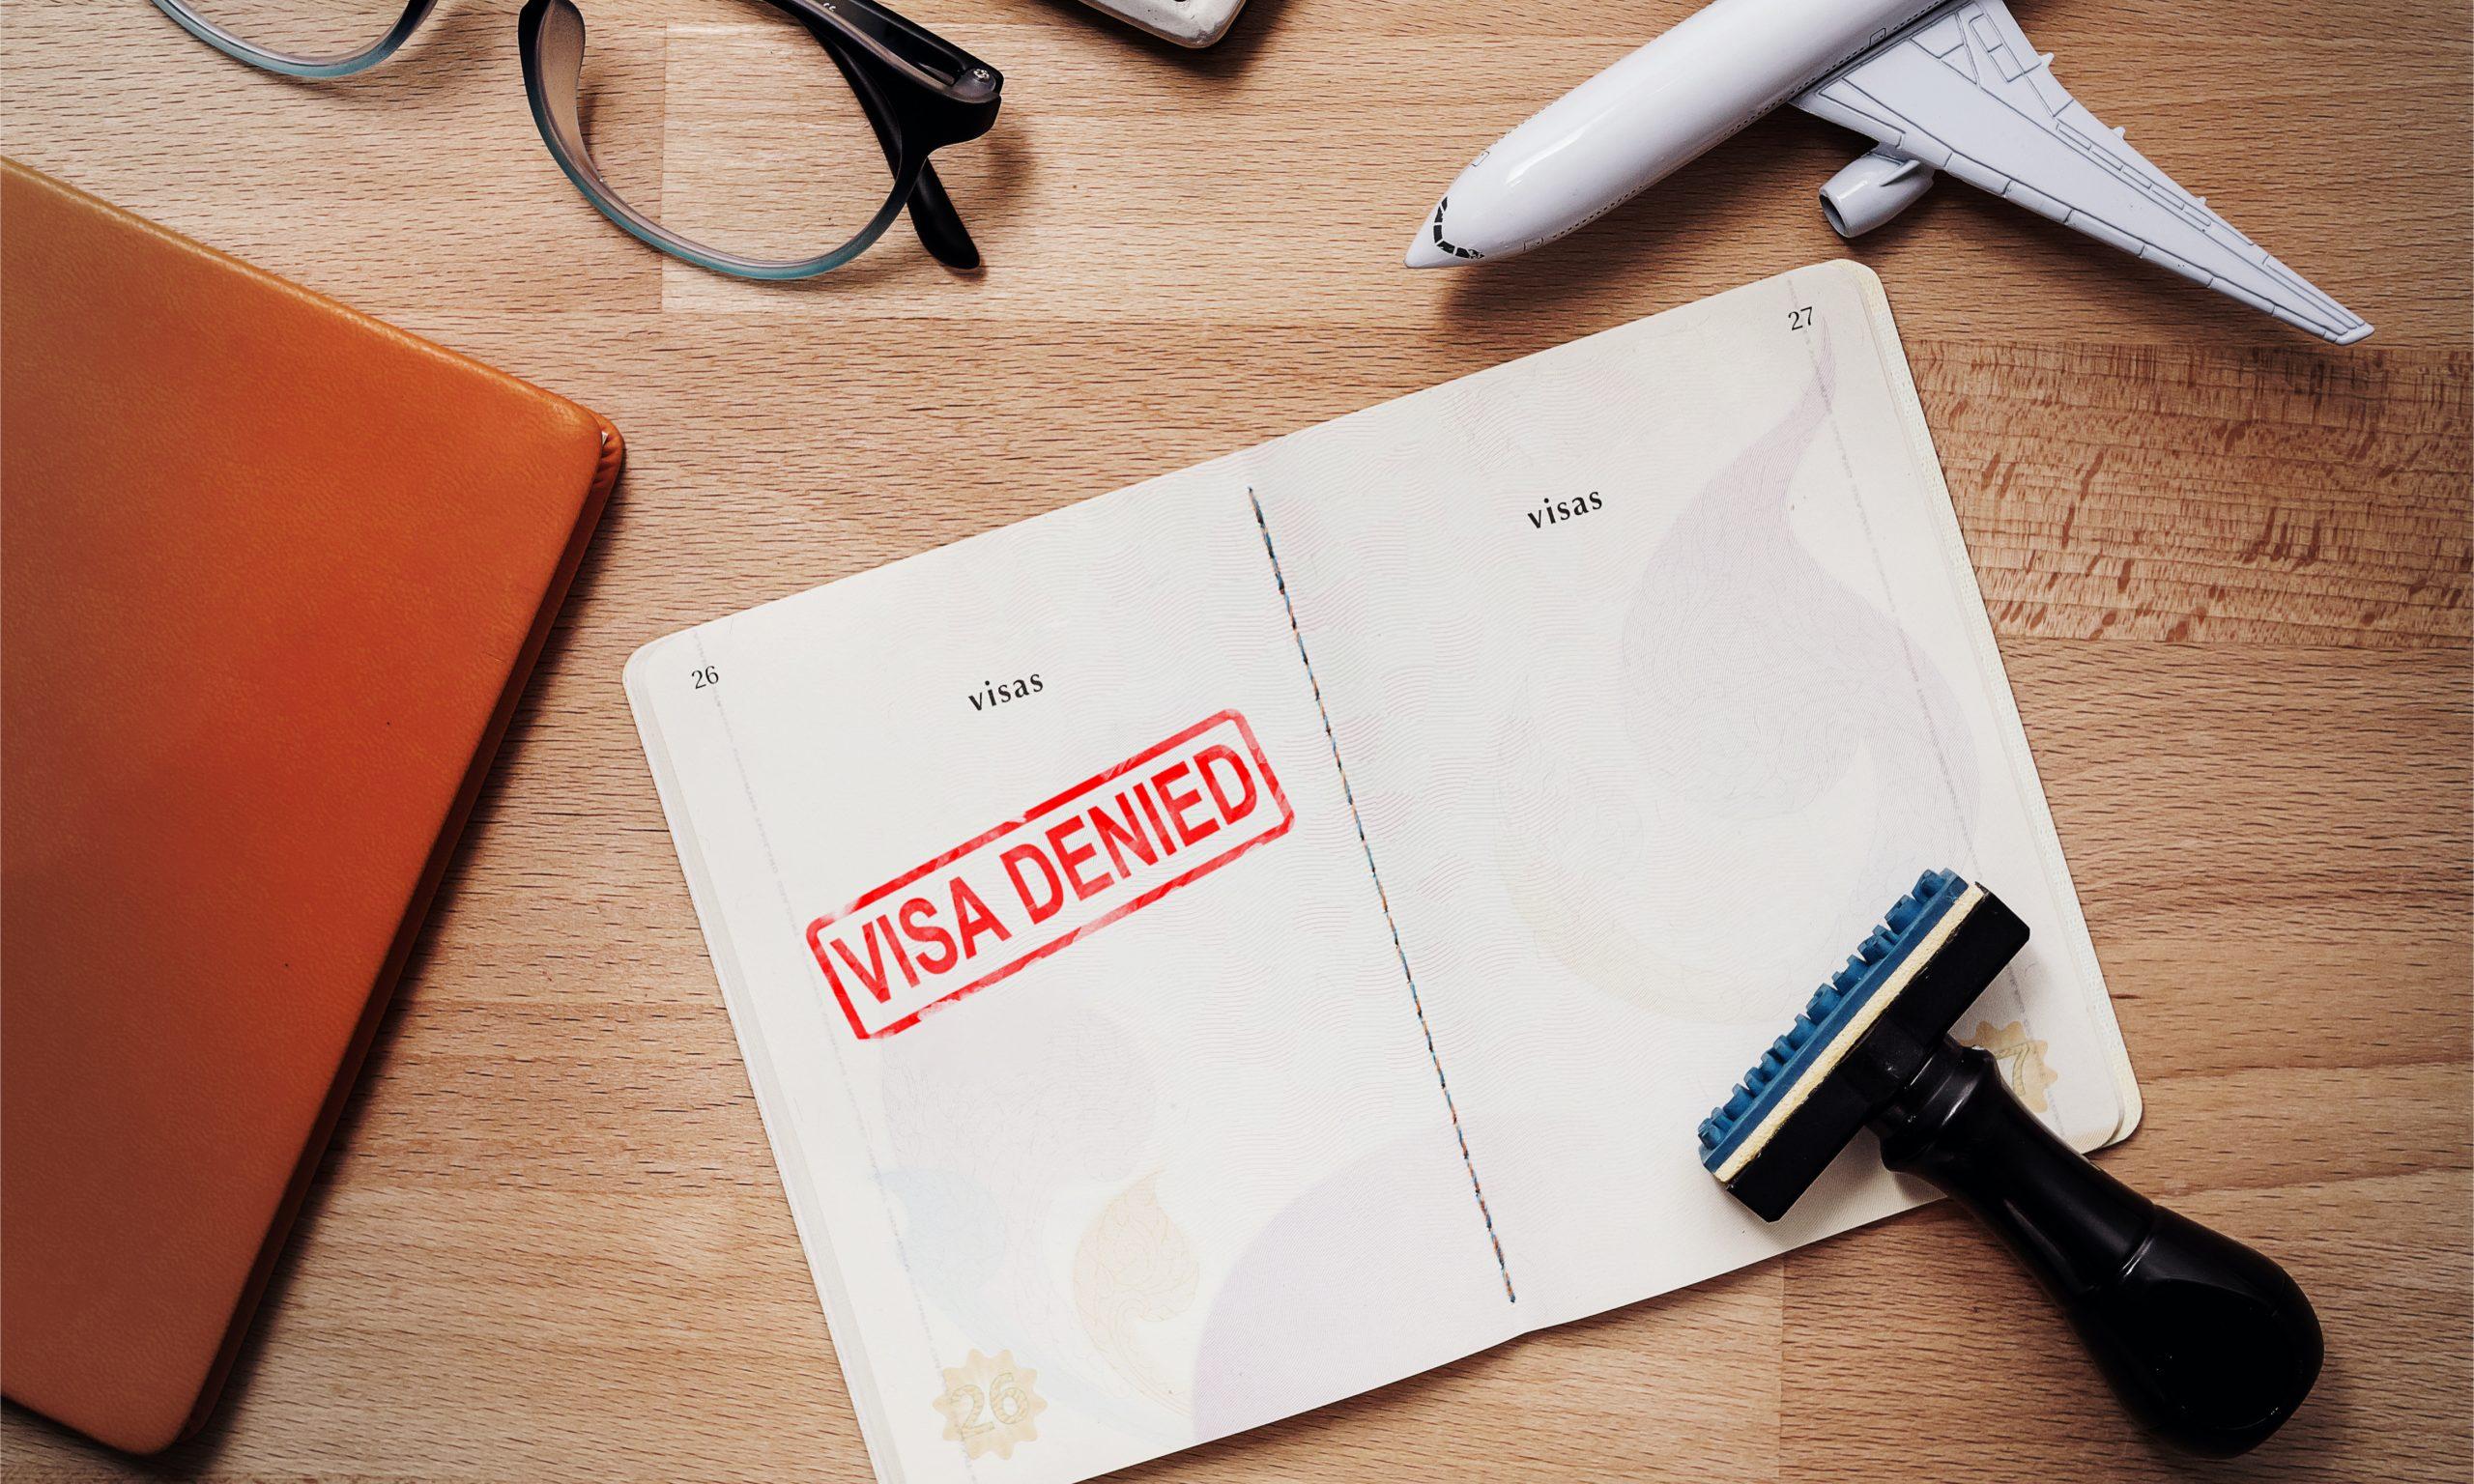 Representative of an Overseas Business Visa - Main reasons to get rejected